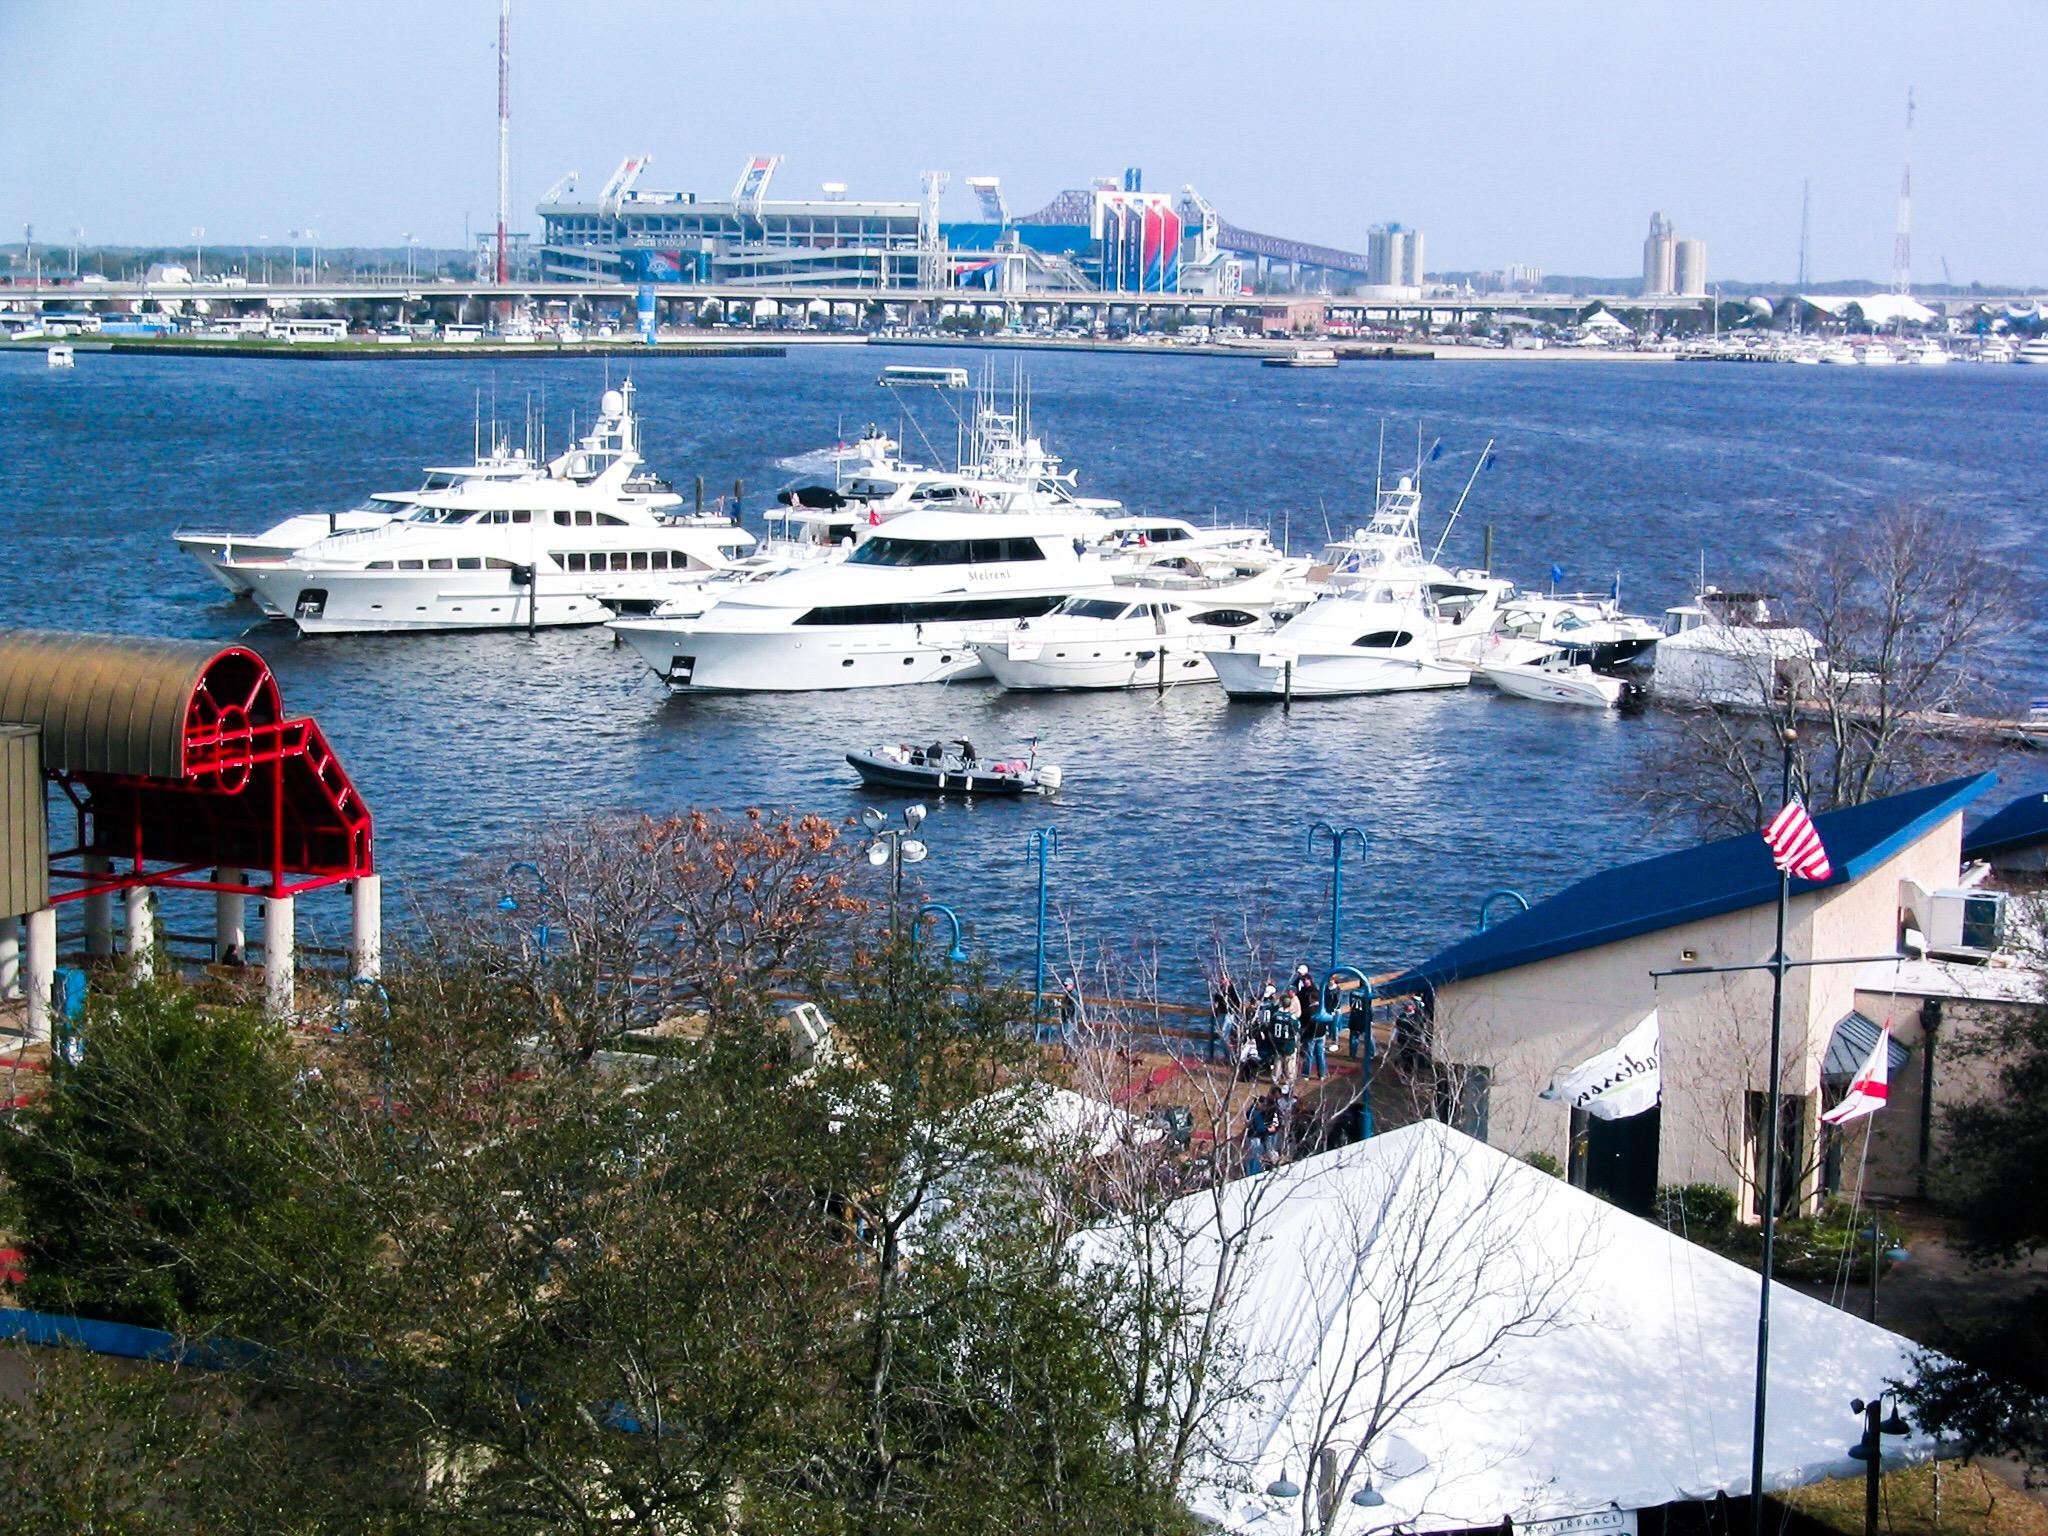 Super Bowl XXXLX - Yachts Docked at Floating Docks - Allsports Productions